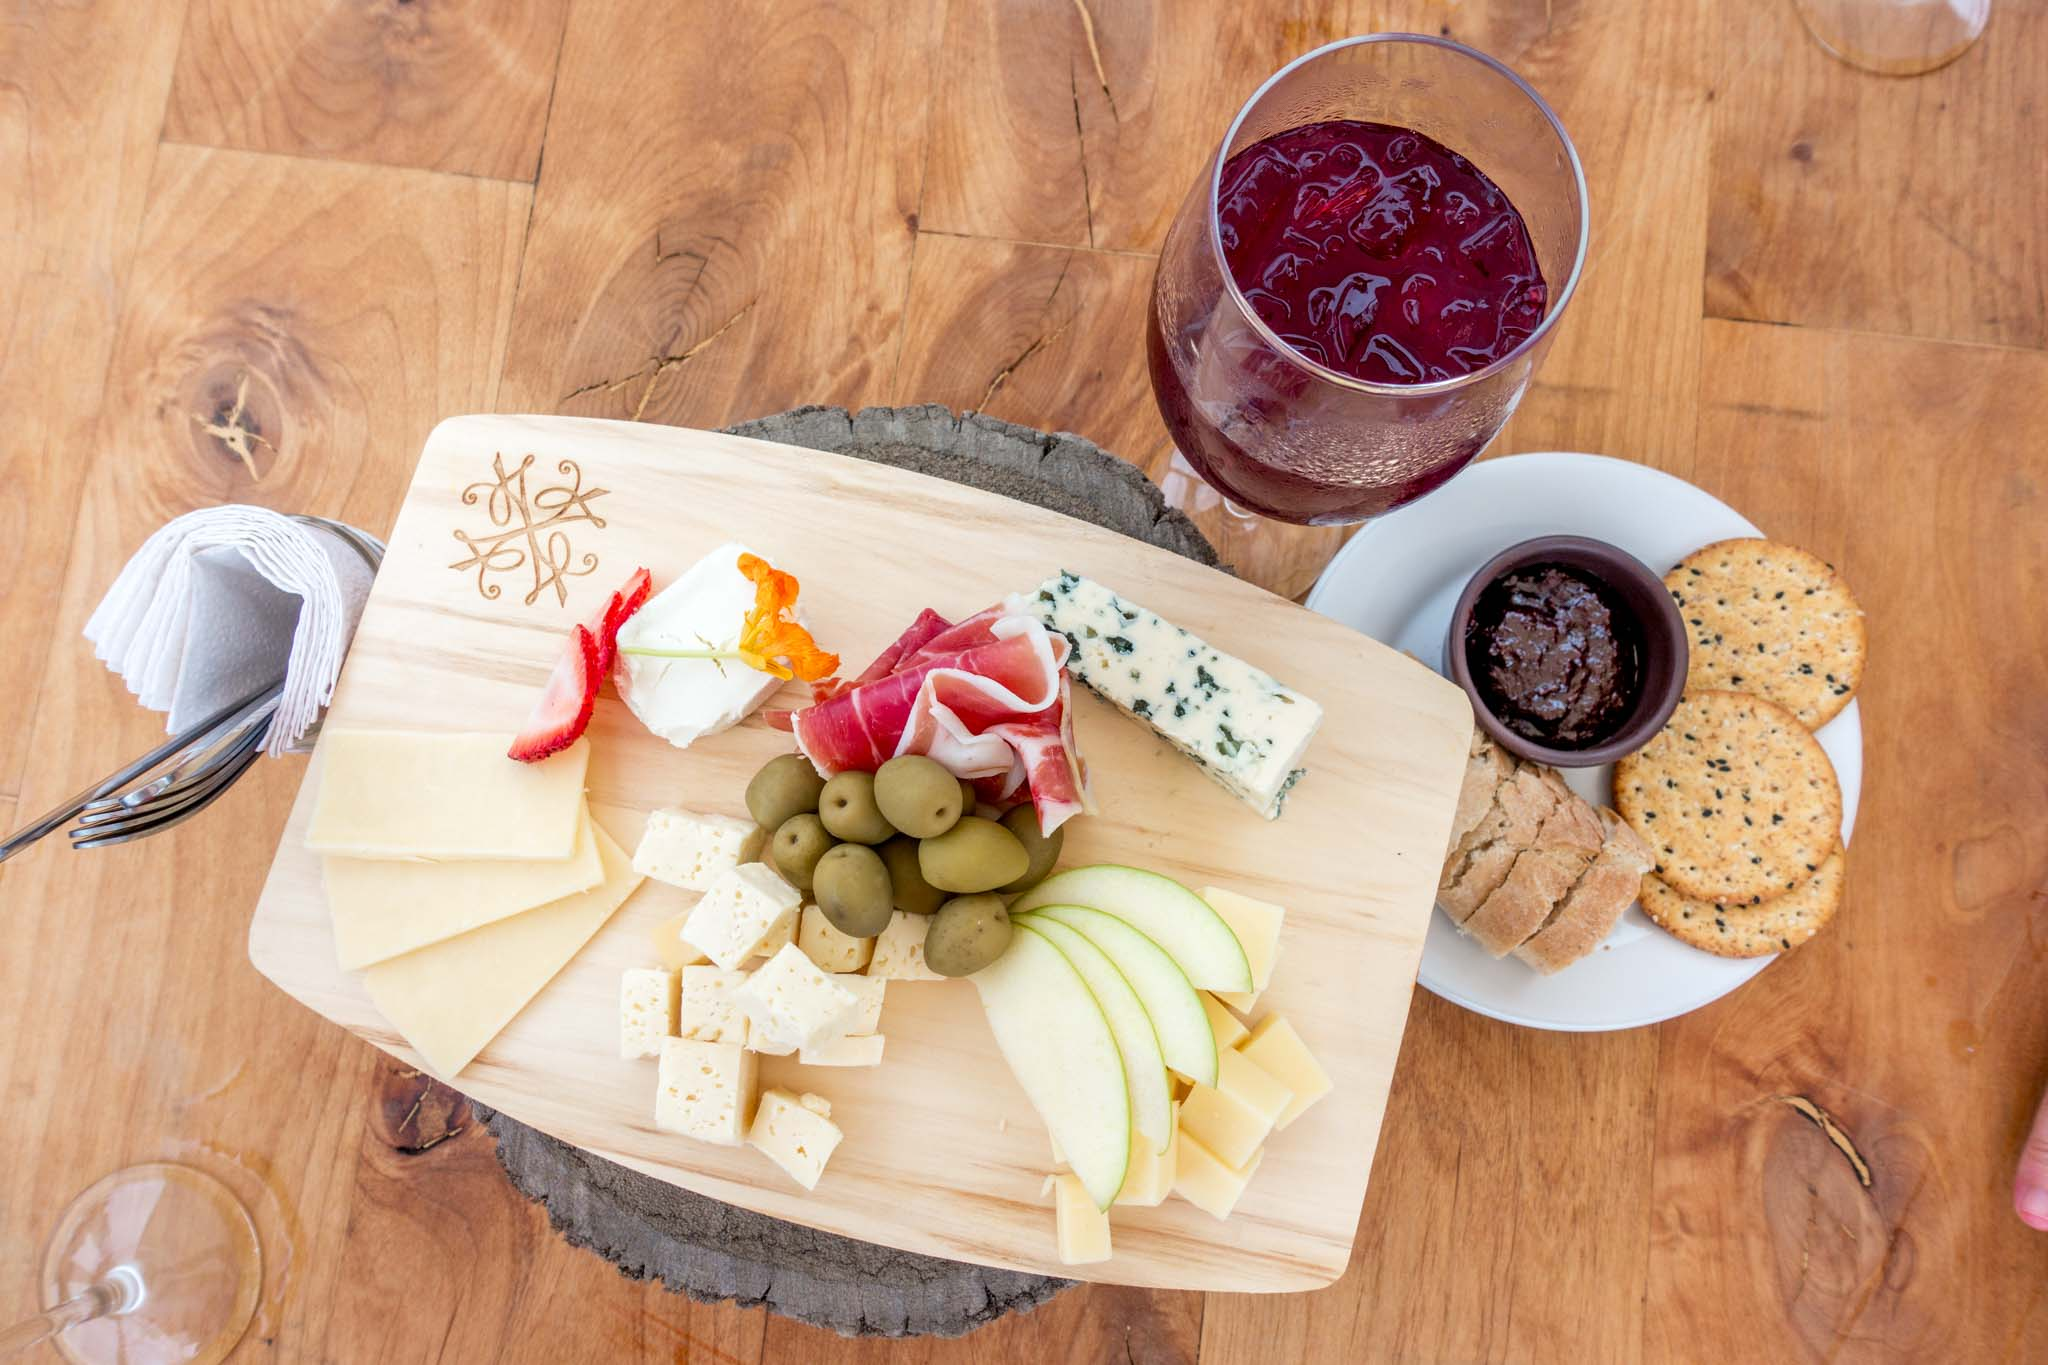 Cheese plate and sangria at Bar Bura at Cuatro Cuatros